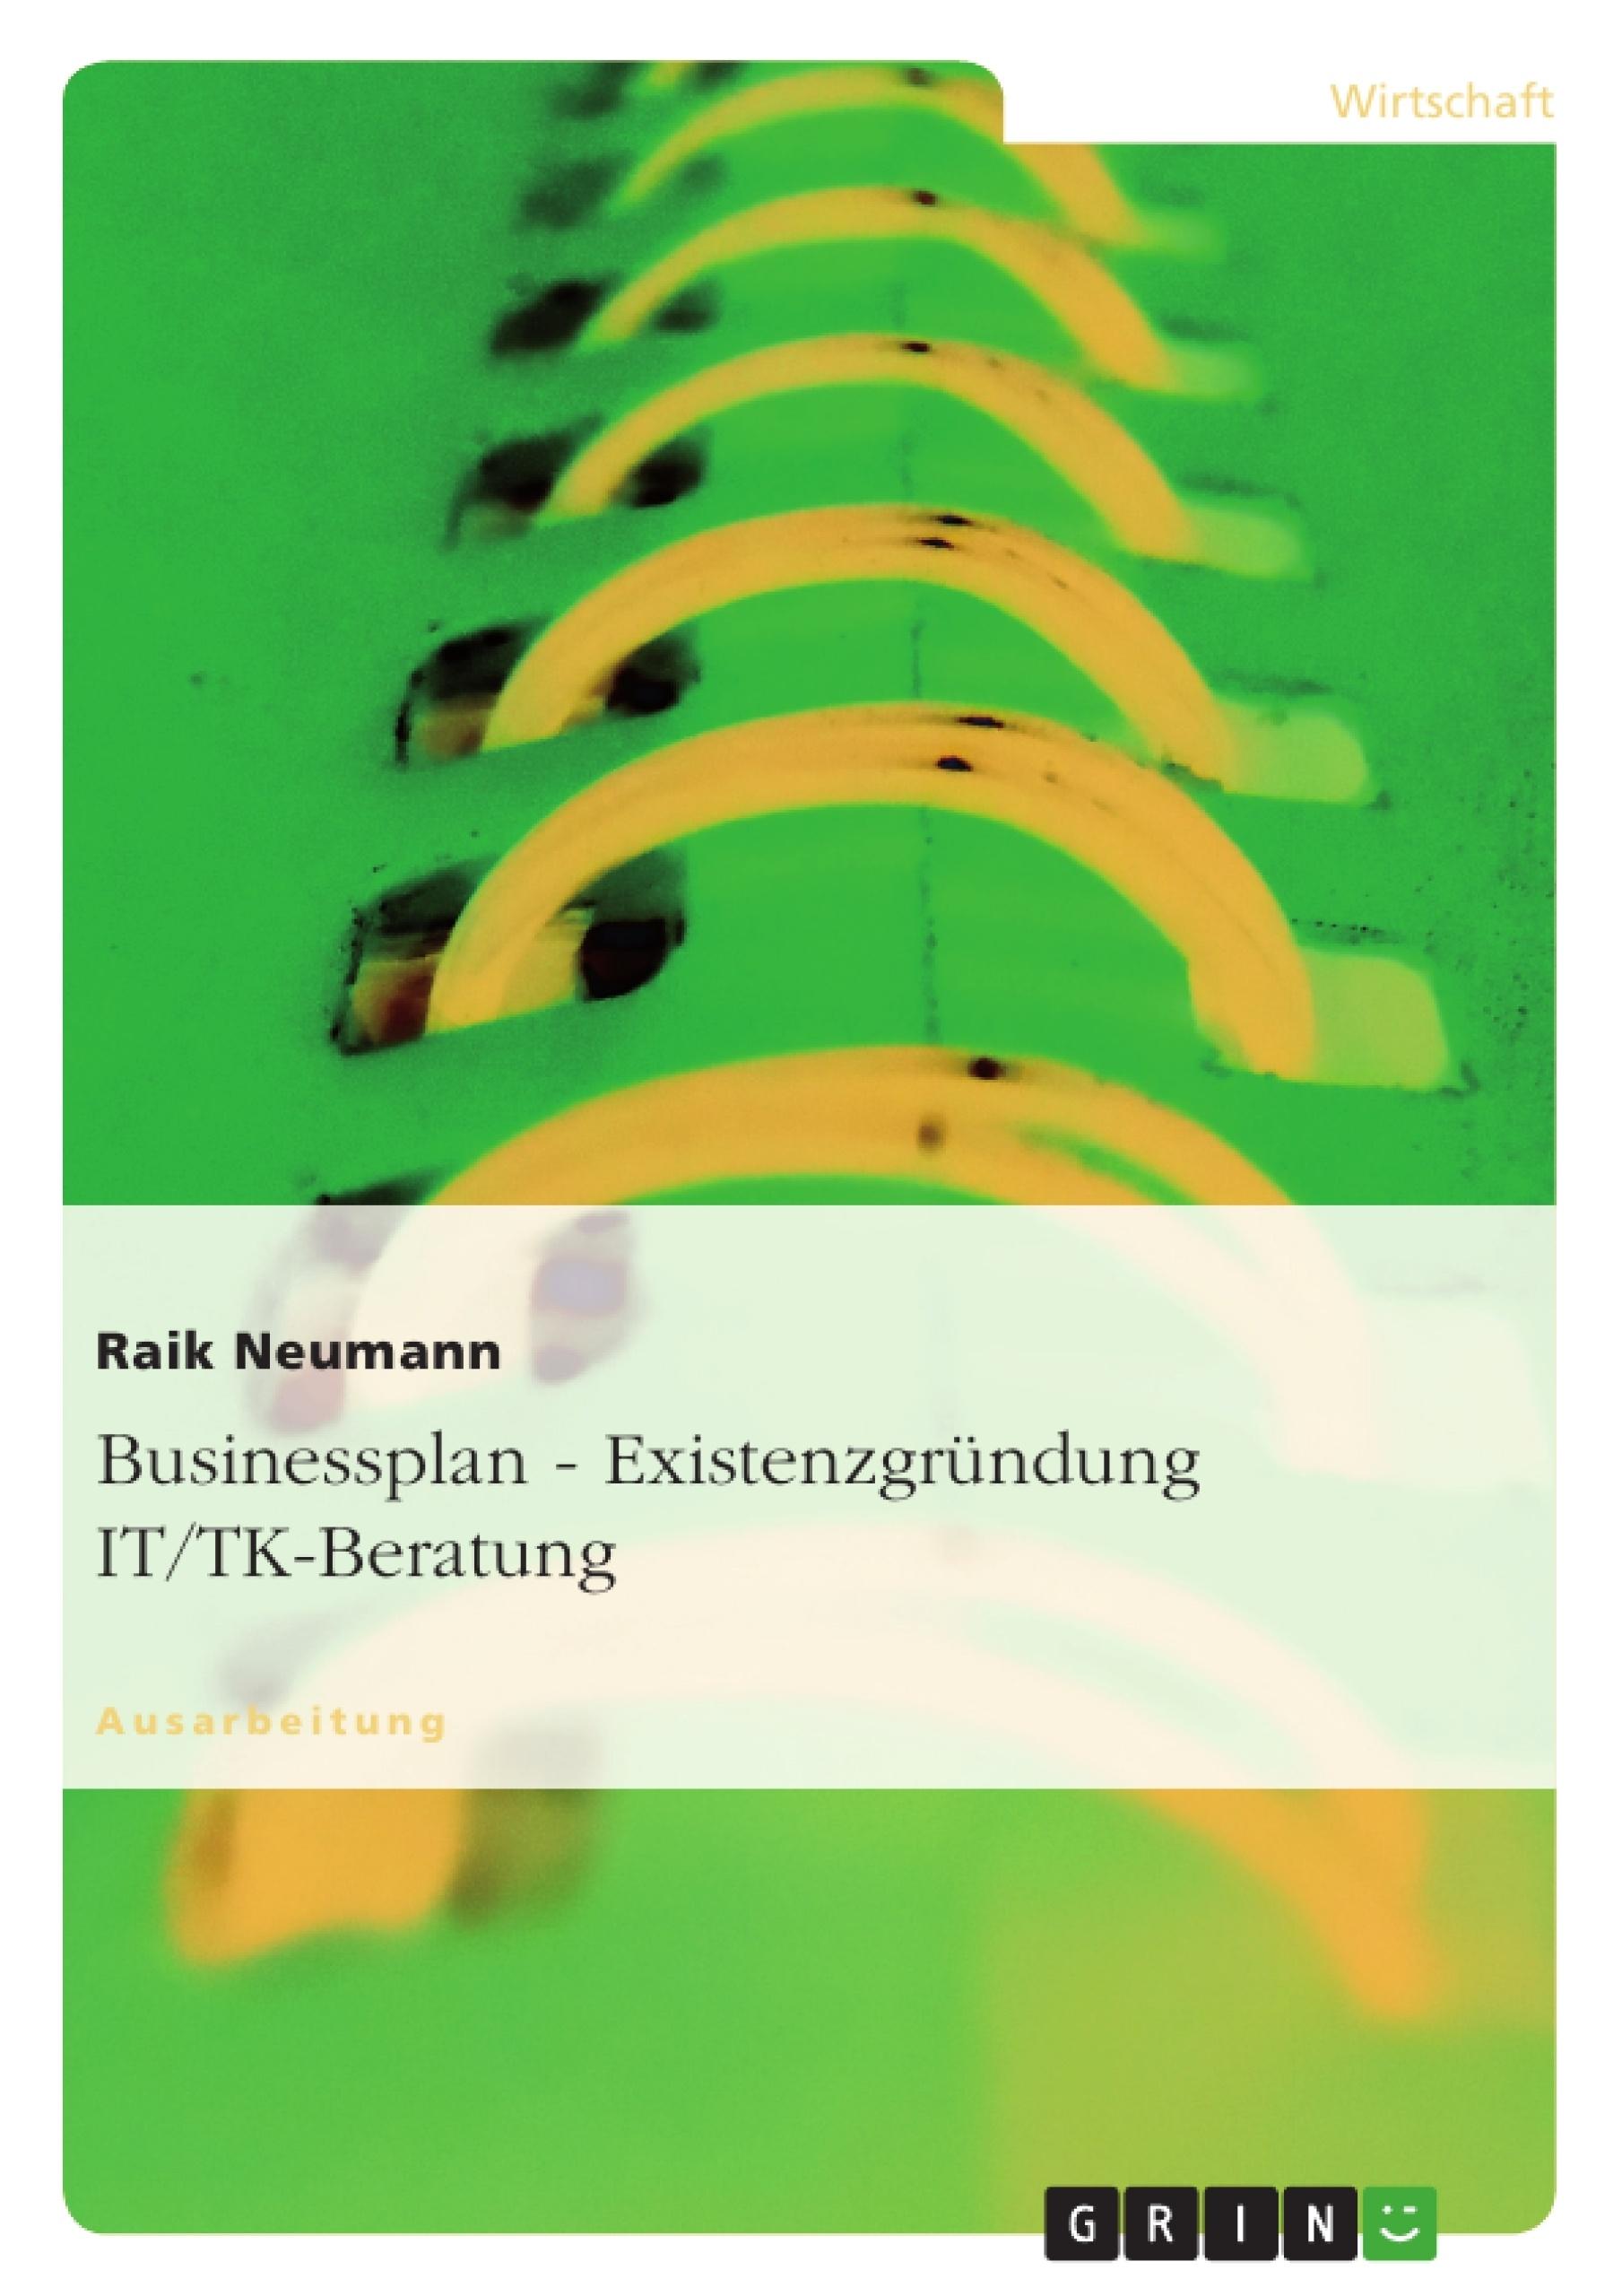 Titel: Businessplan - Existenzgründung IT/TK-Beratung